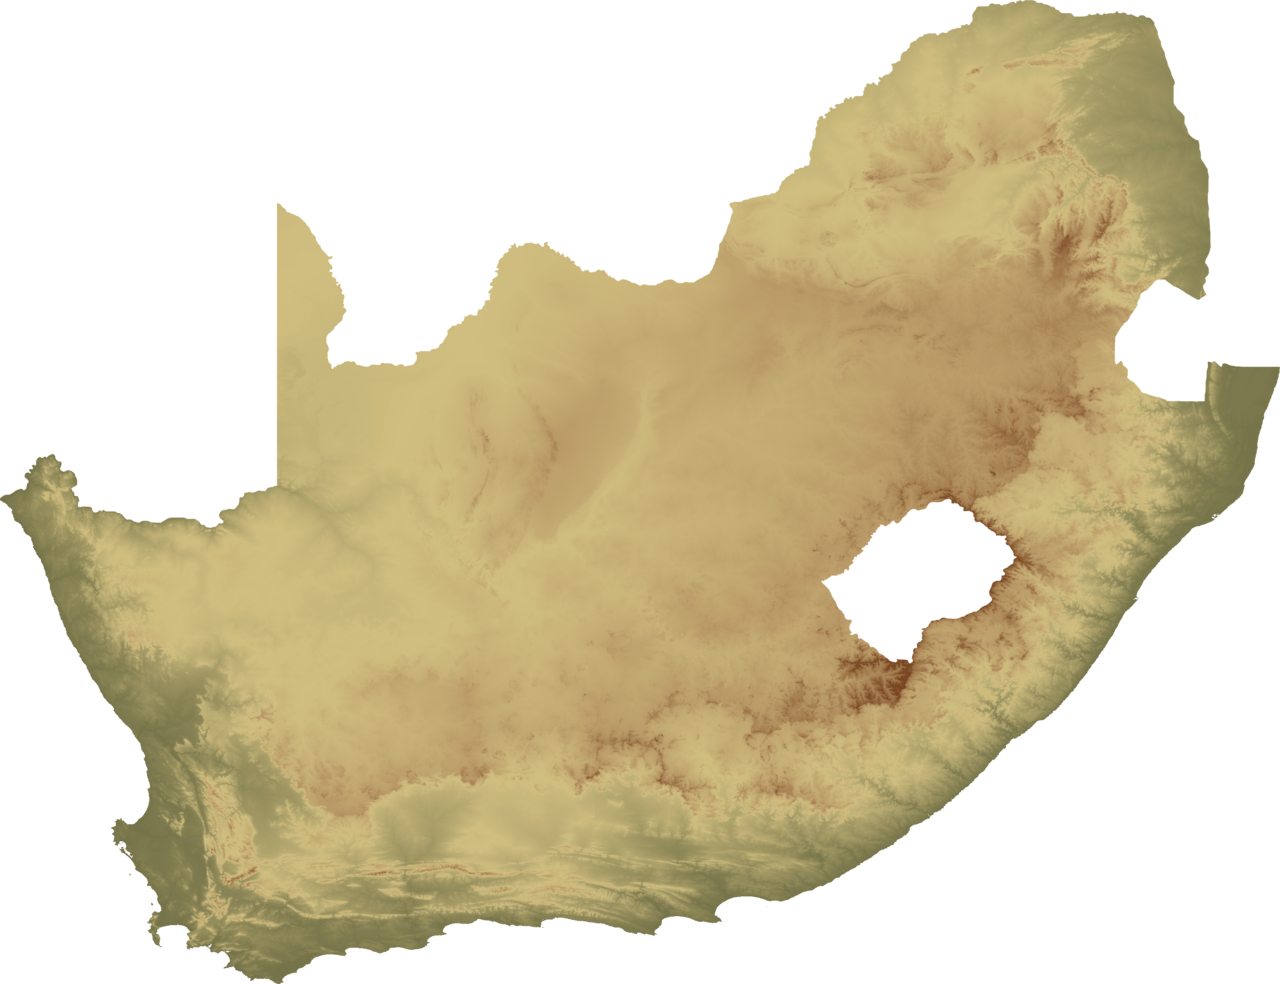 Island PNG - 1640